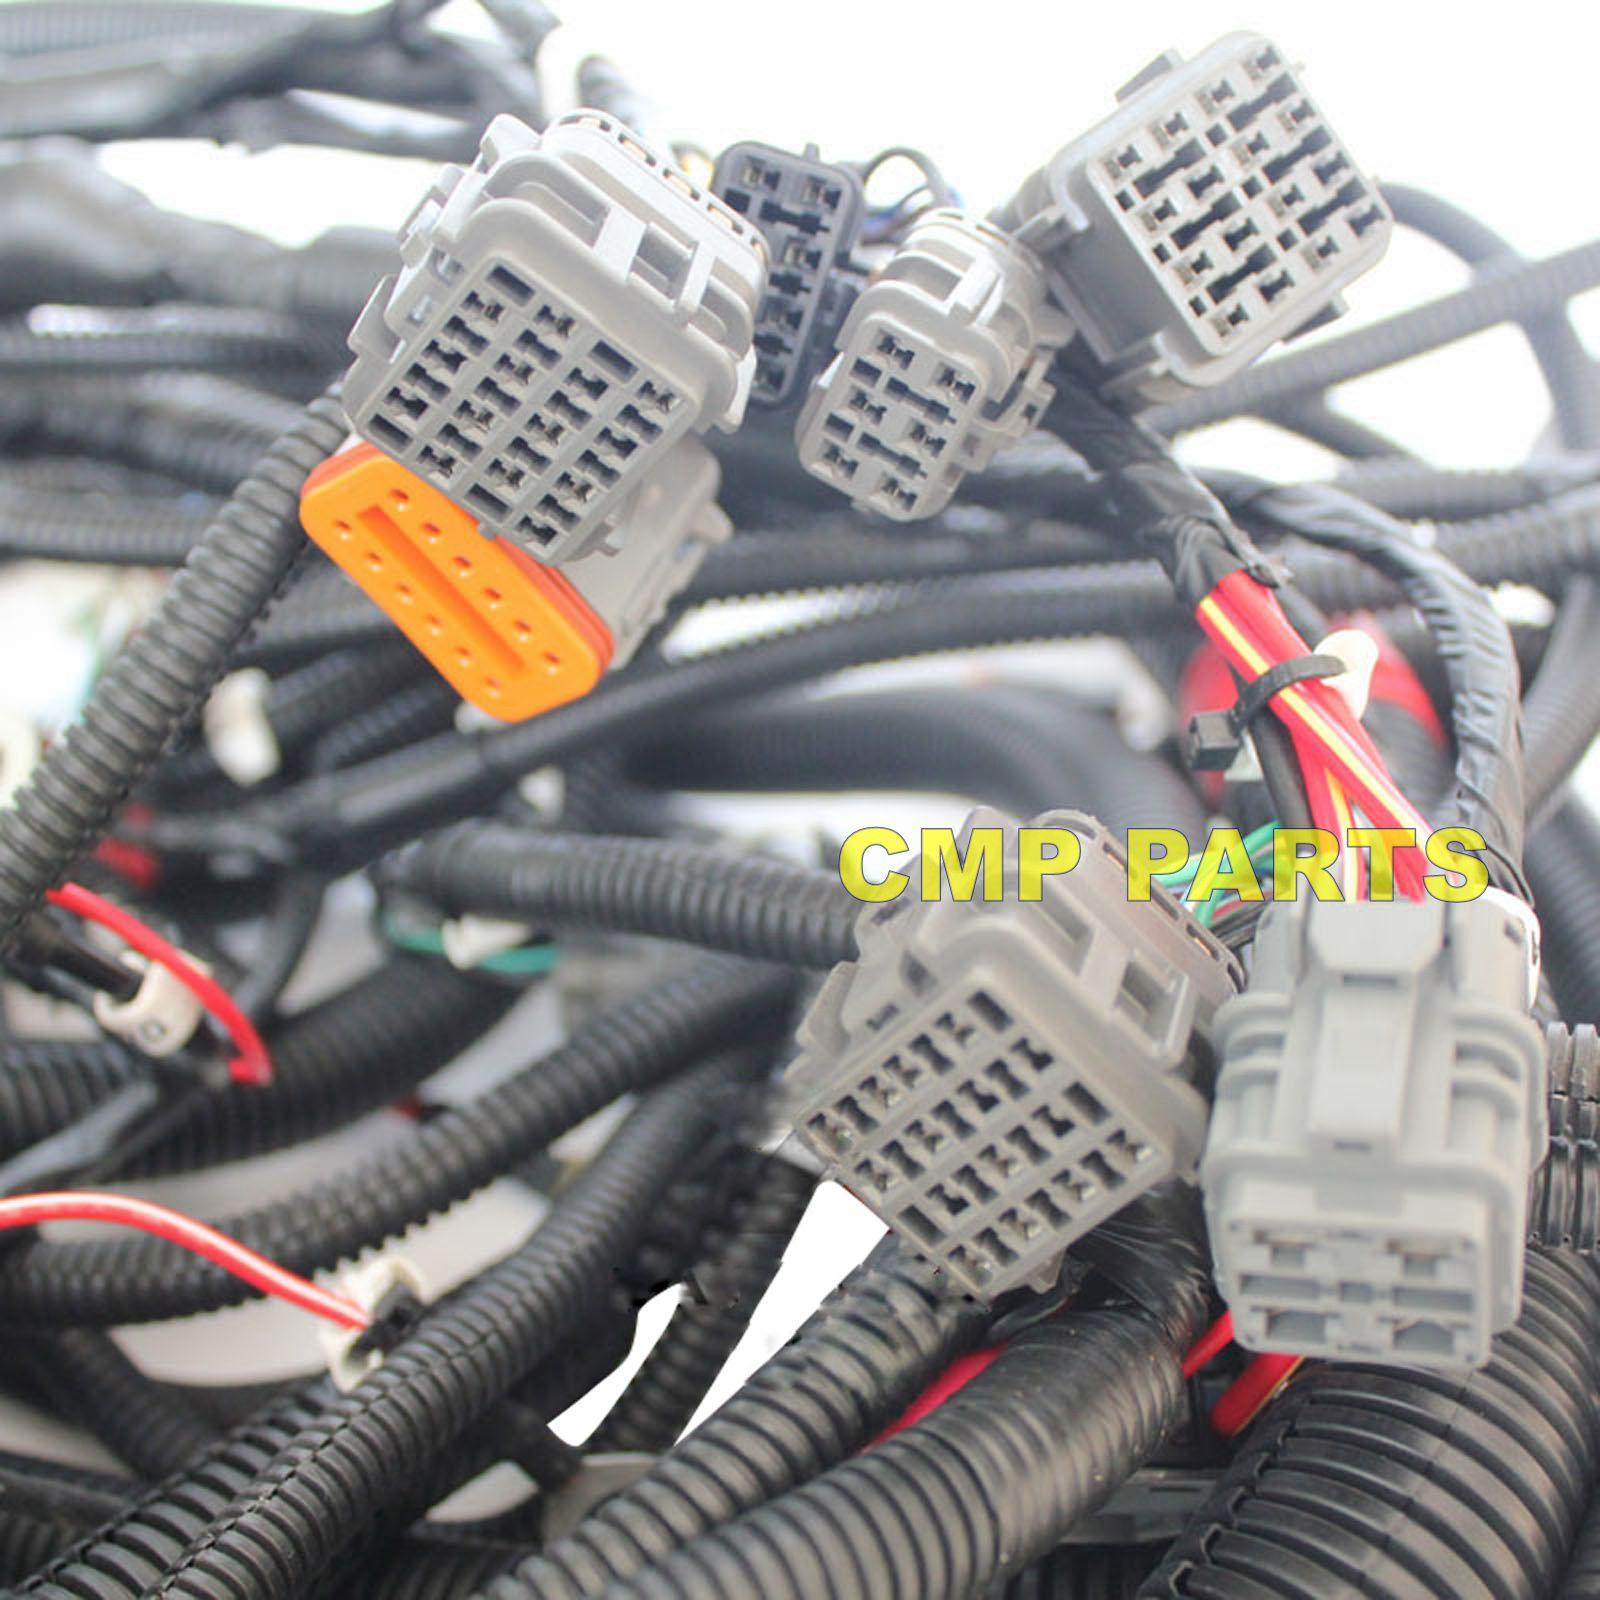 y external wiring harness new for komatsu excavator productpicture0 productpicture1 productpicture2